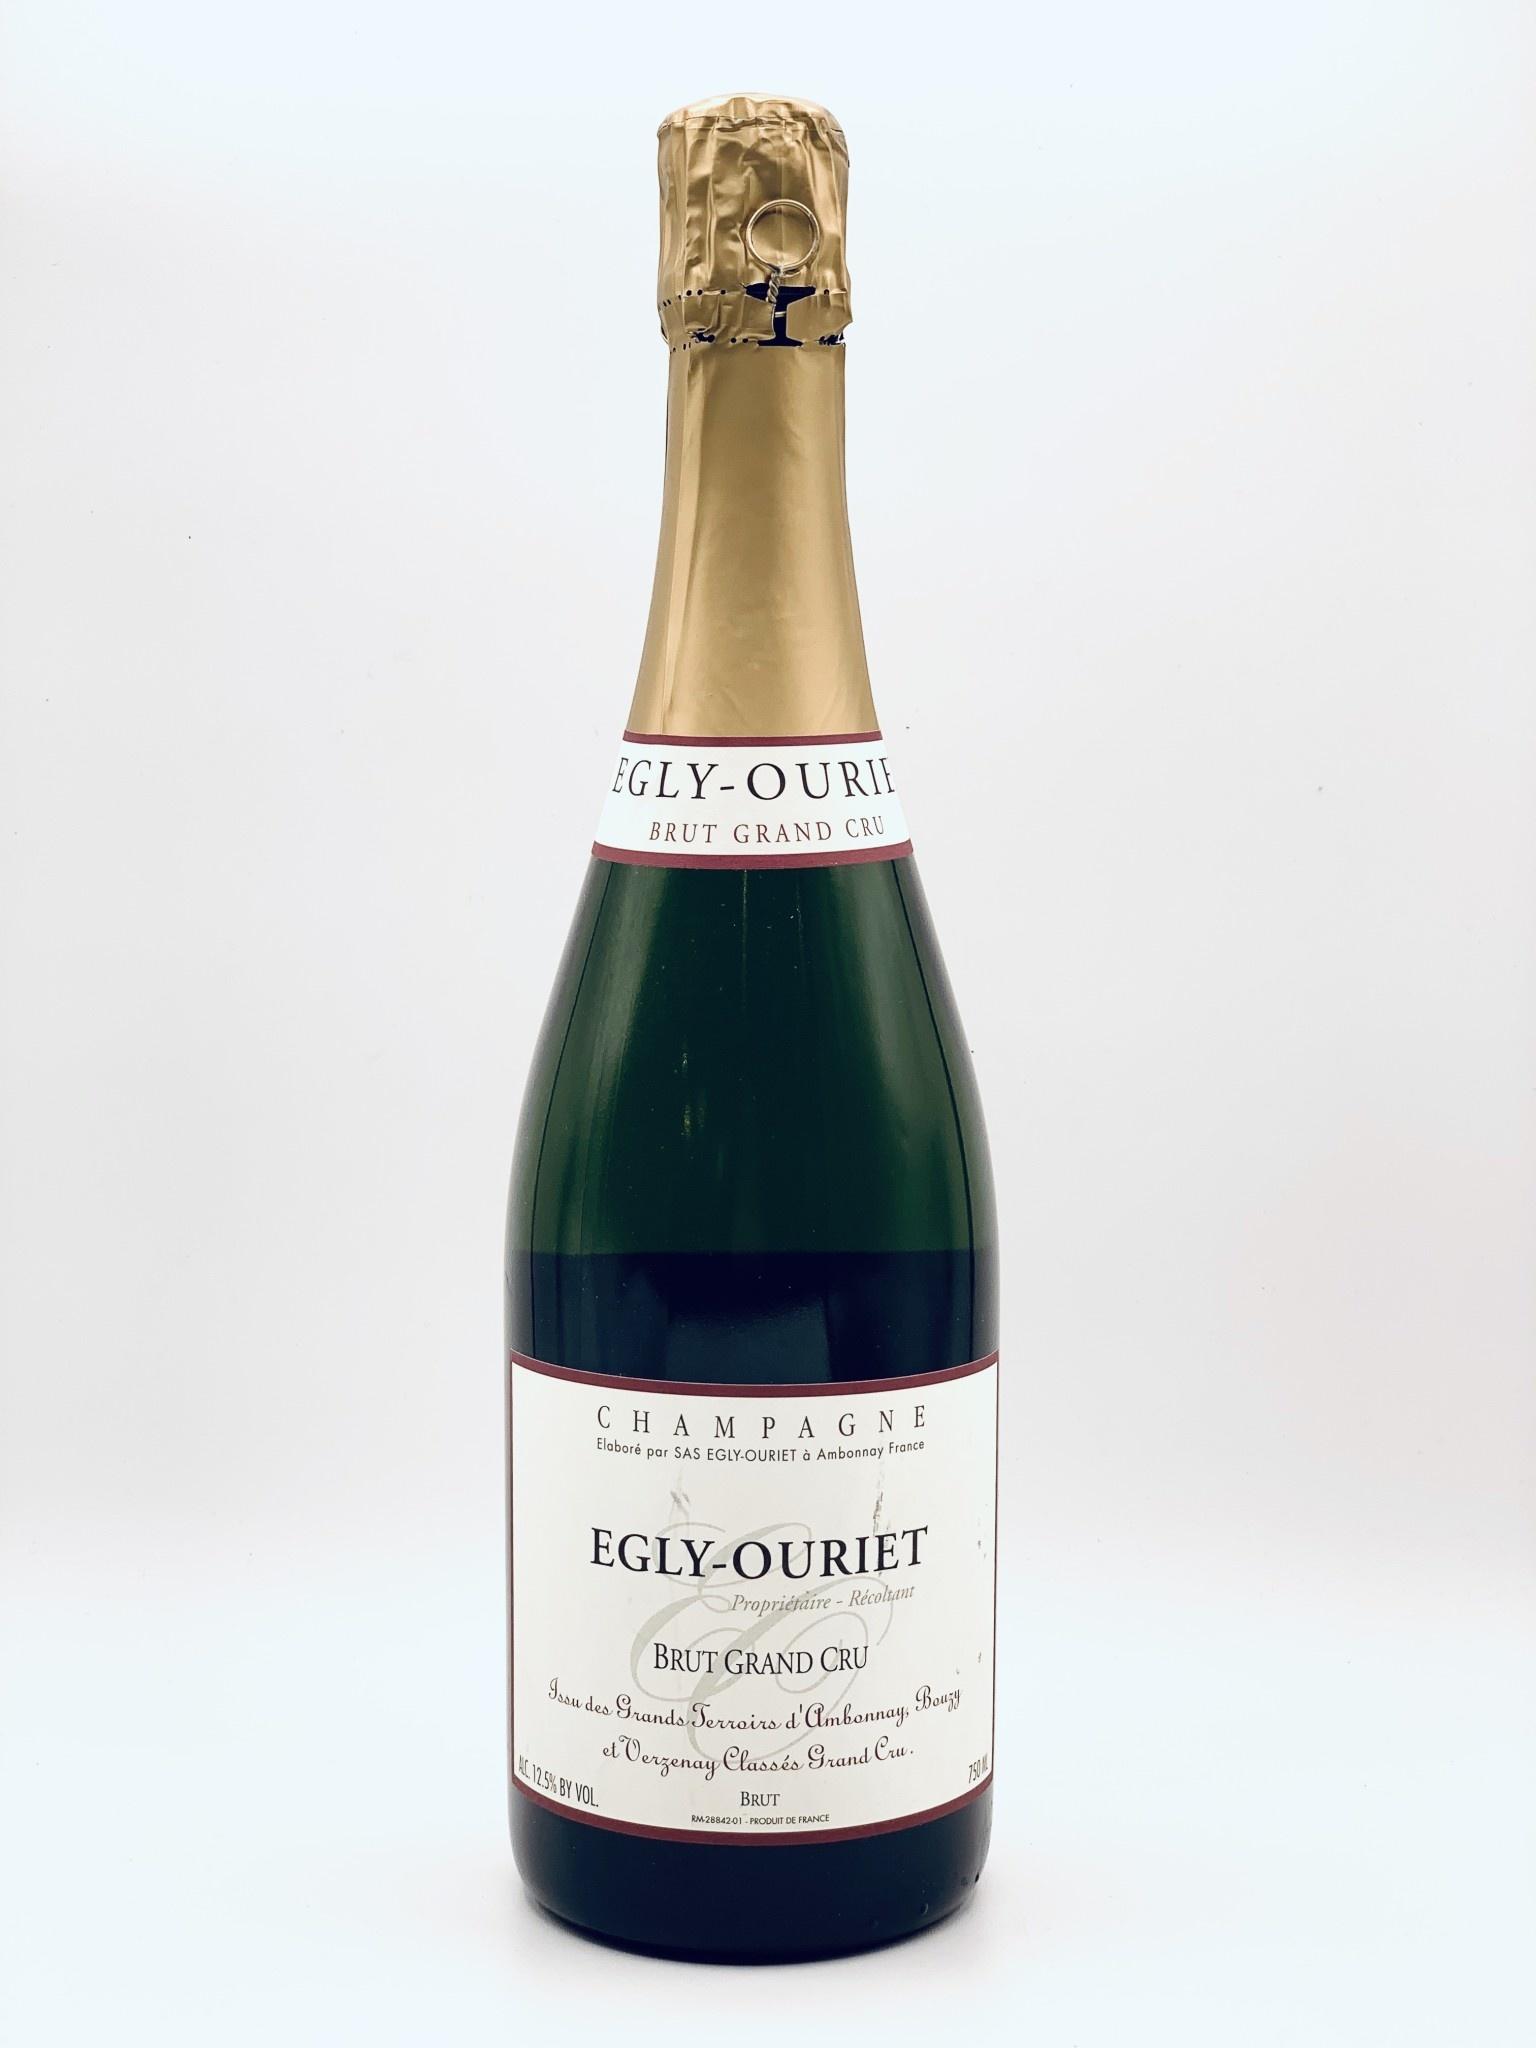 Champagne Brut Grand Cru NV Egly-Ouriet  750ml